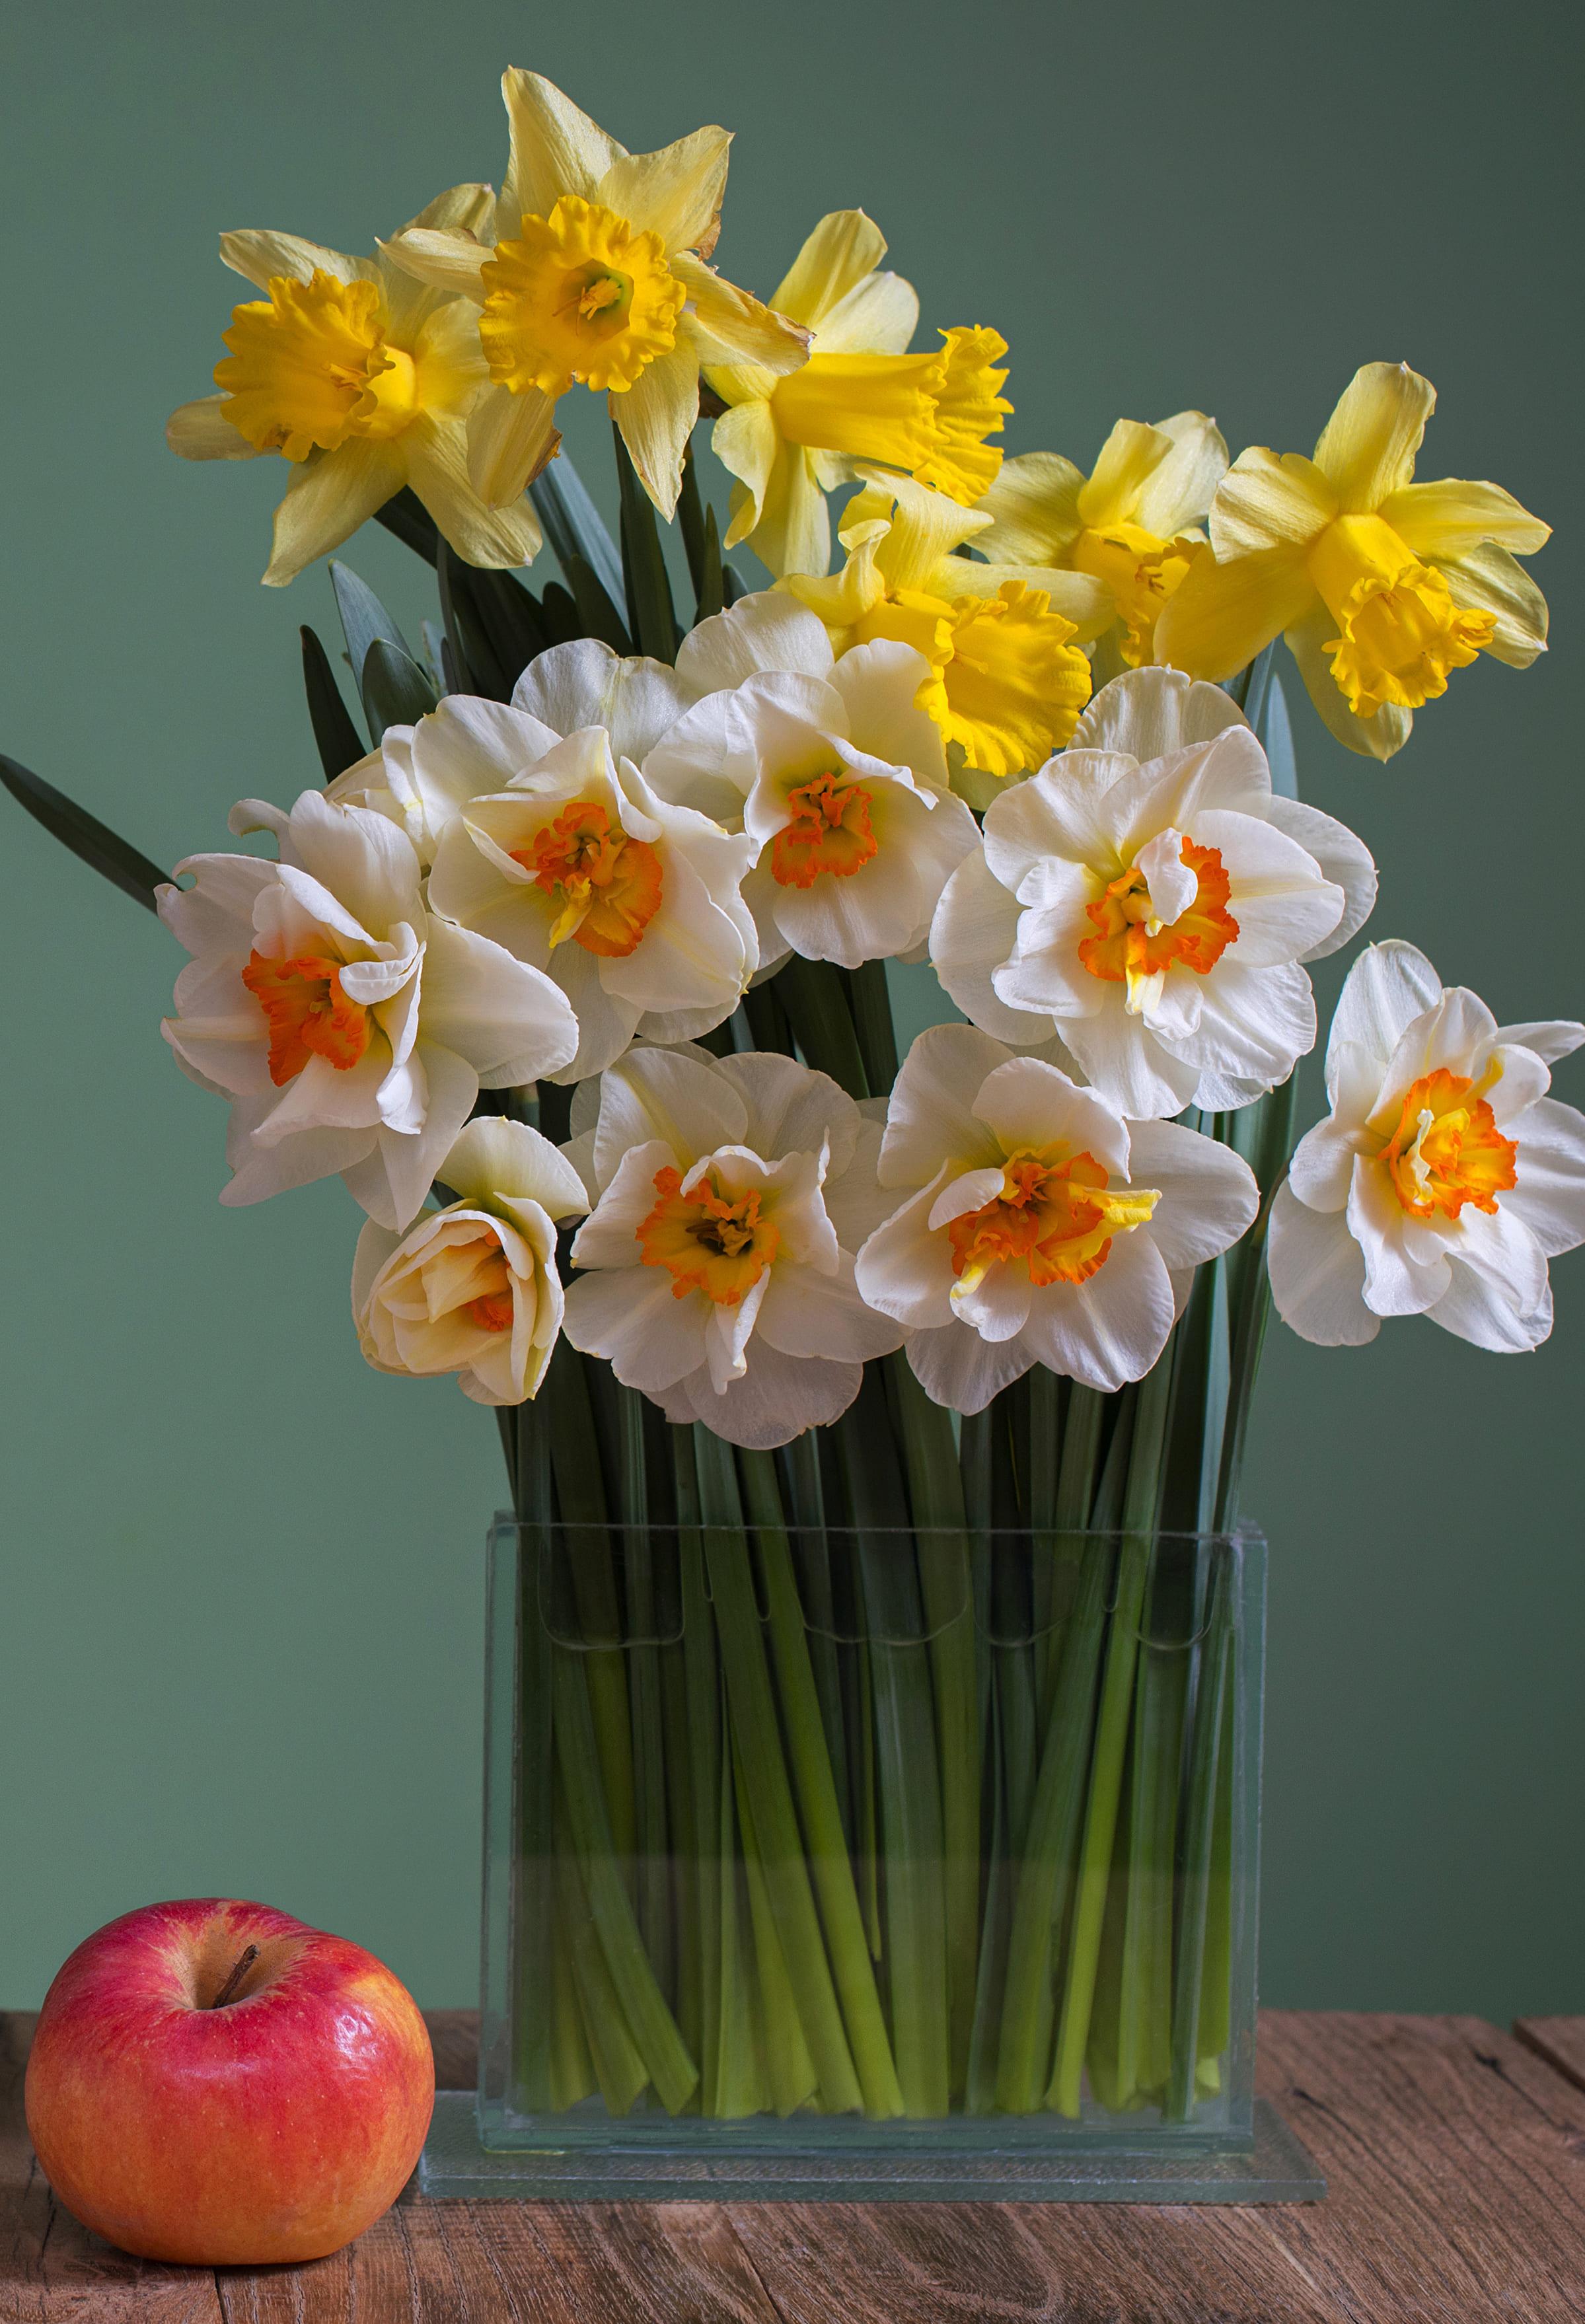 daffodils-photo-98